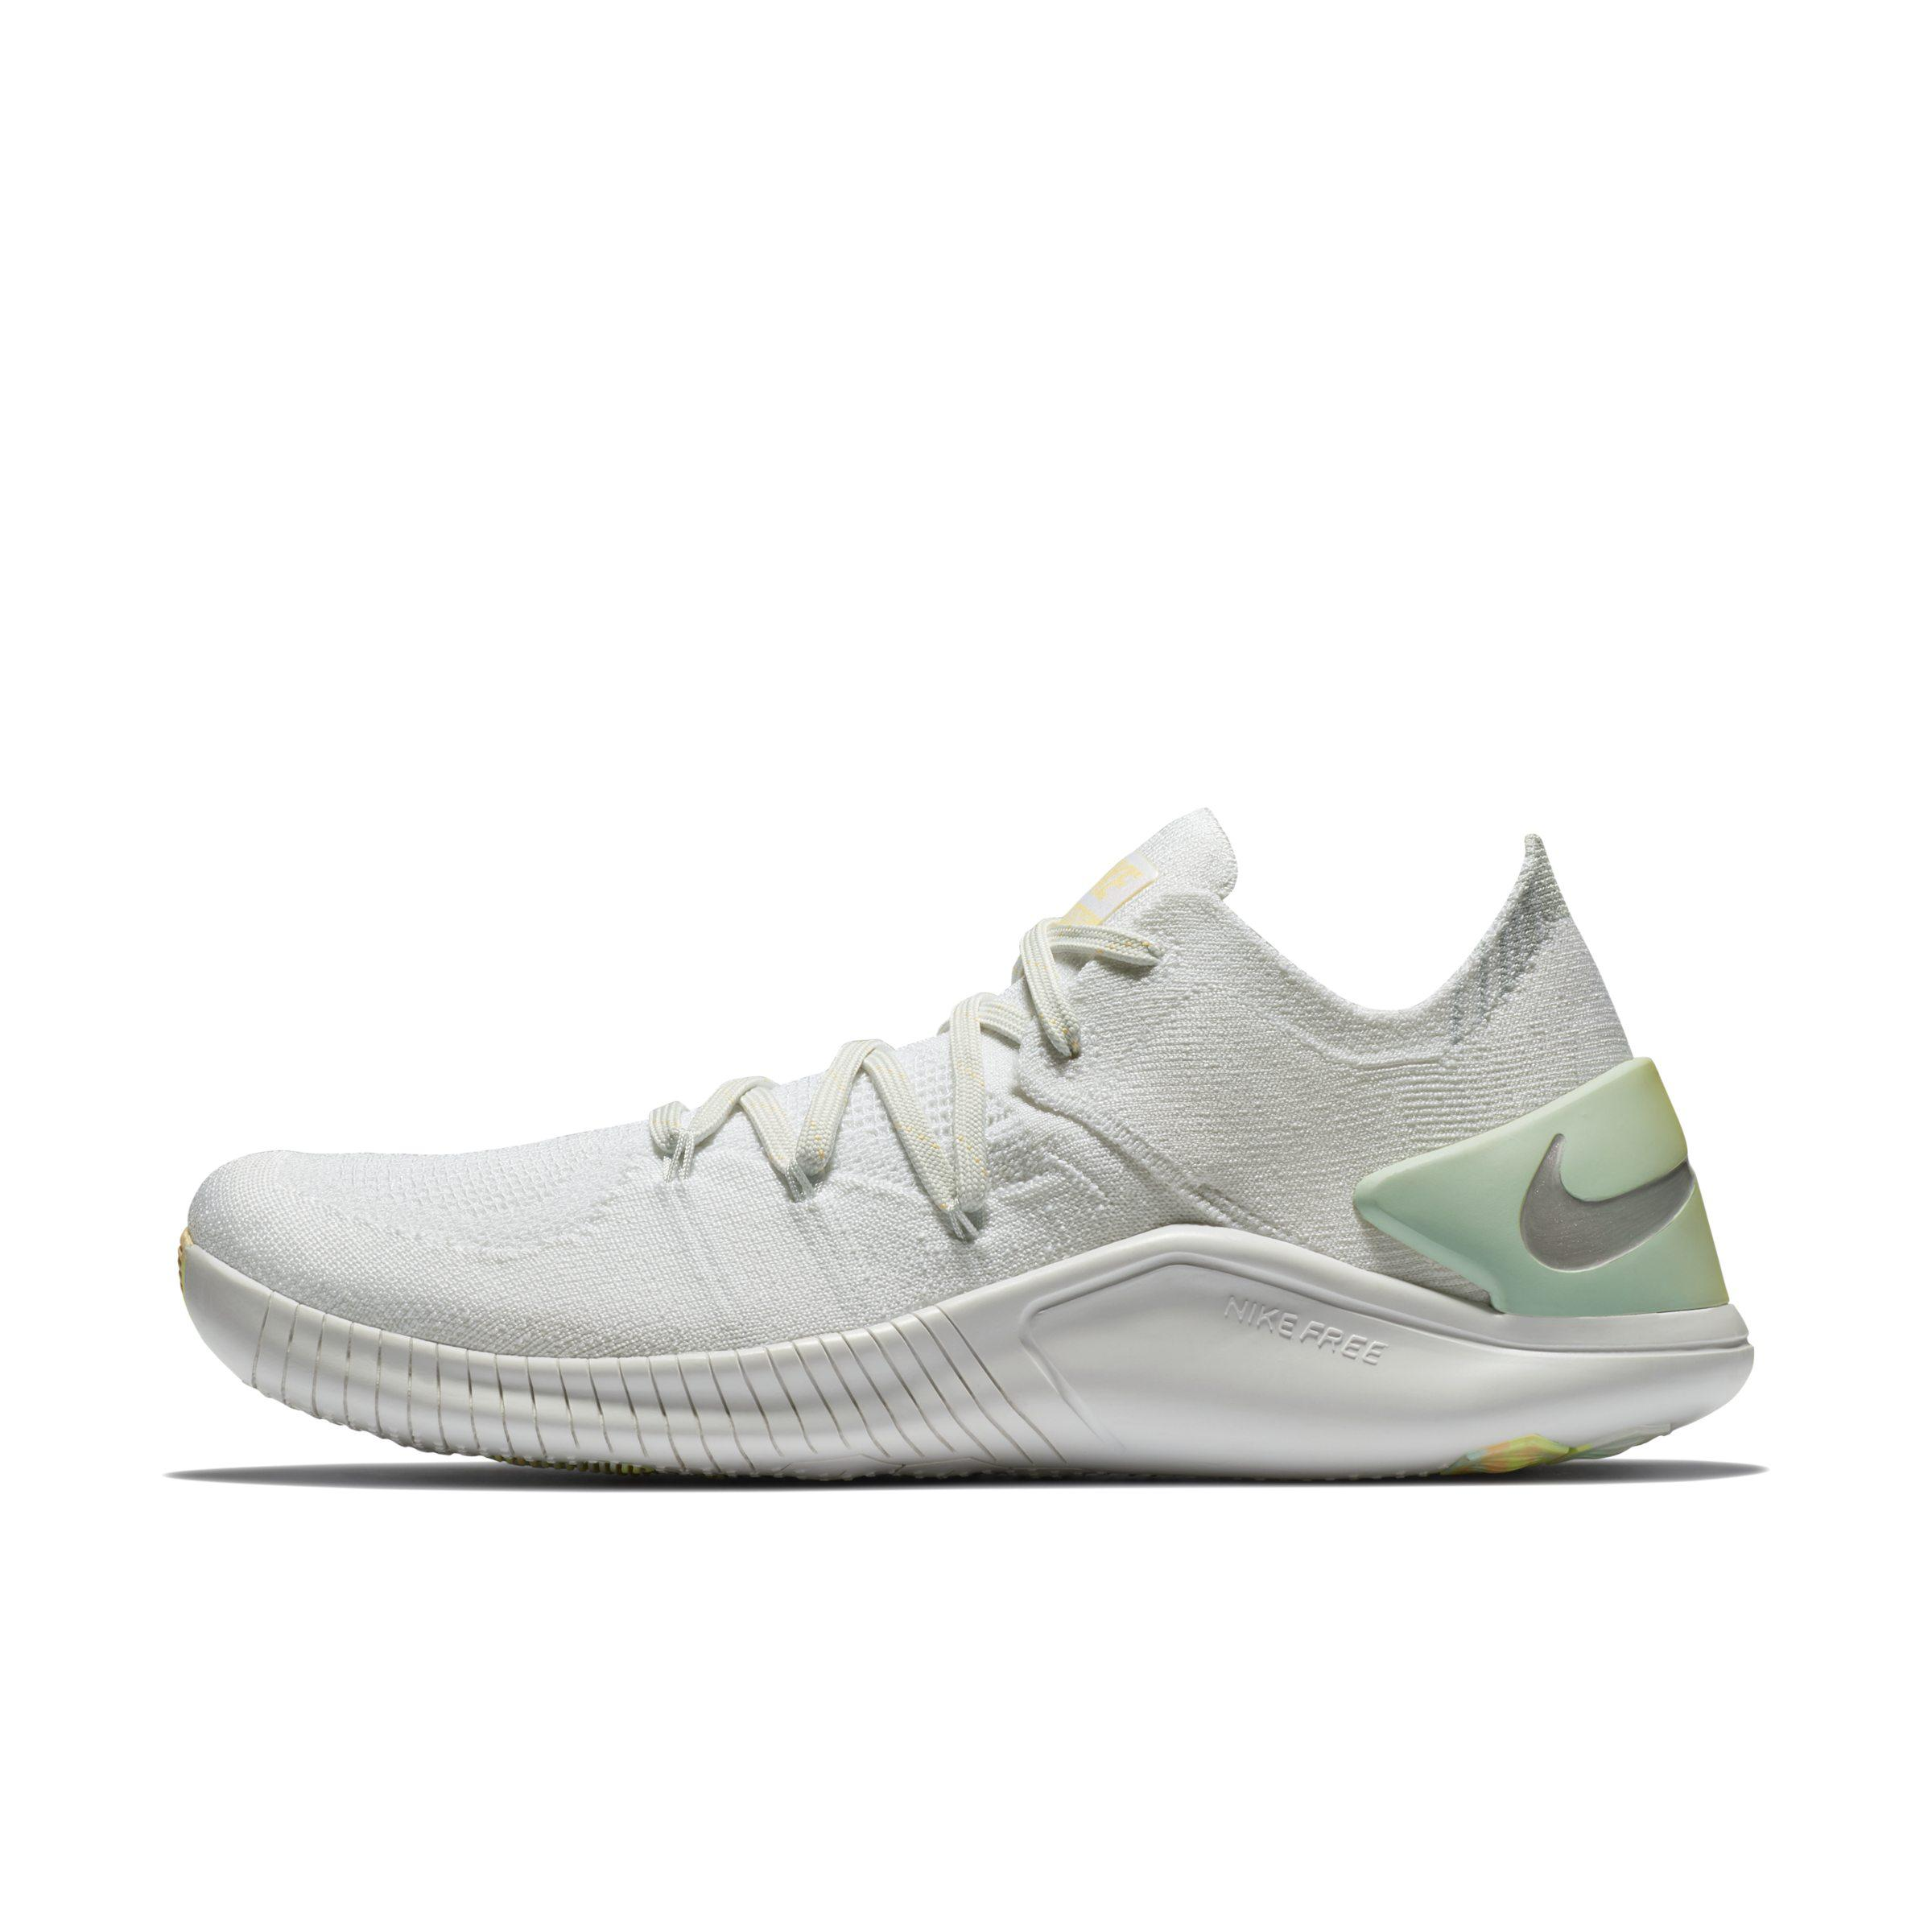 d09bffab0b007 Nike Free Tr Flyknit 3 Rise Training Shoe in White - Lyst